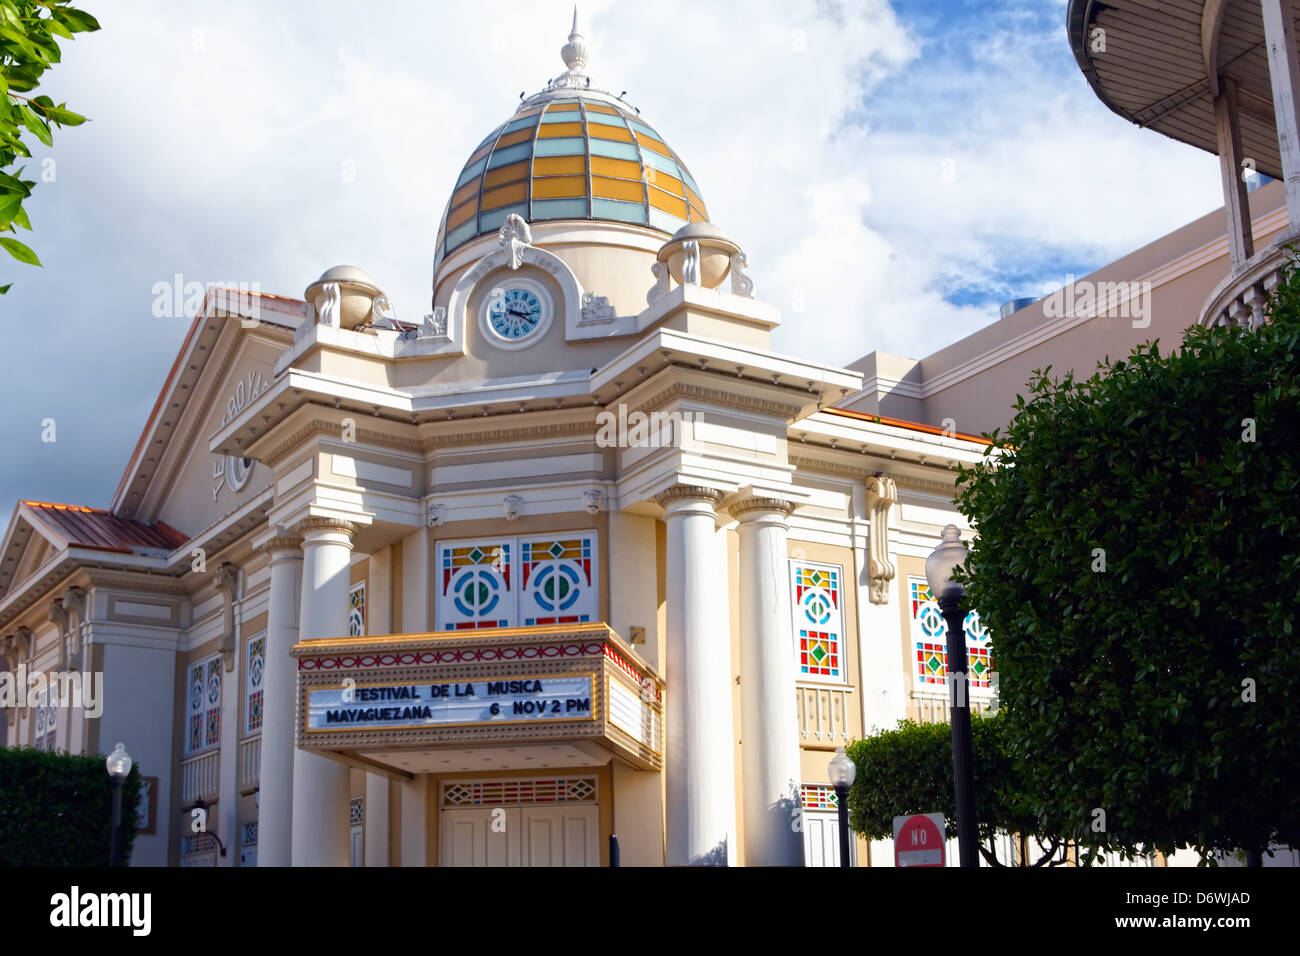 Puerto Rico, Mayaguez, Low Angle View of Mayaguez Theater - Stock Image